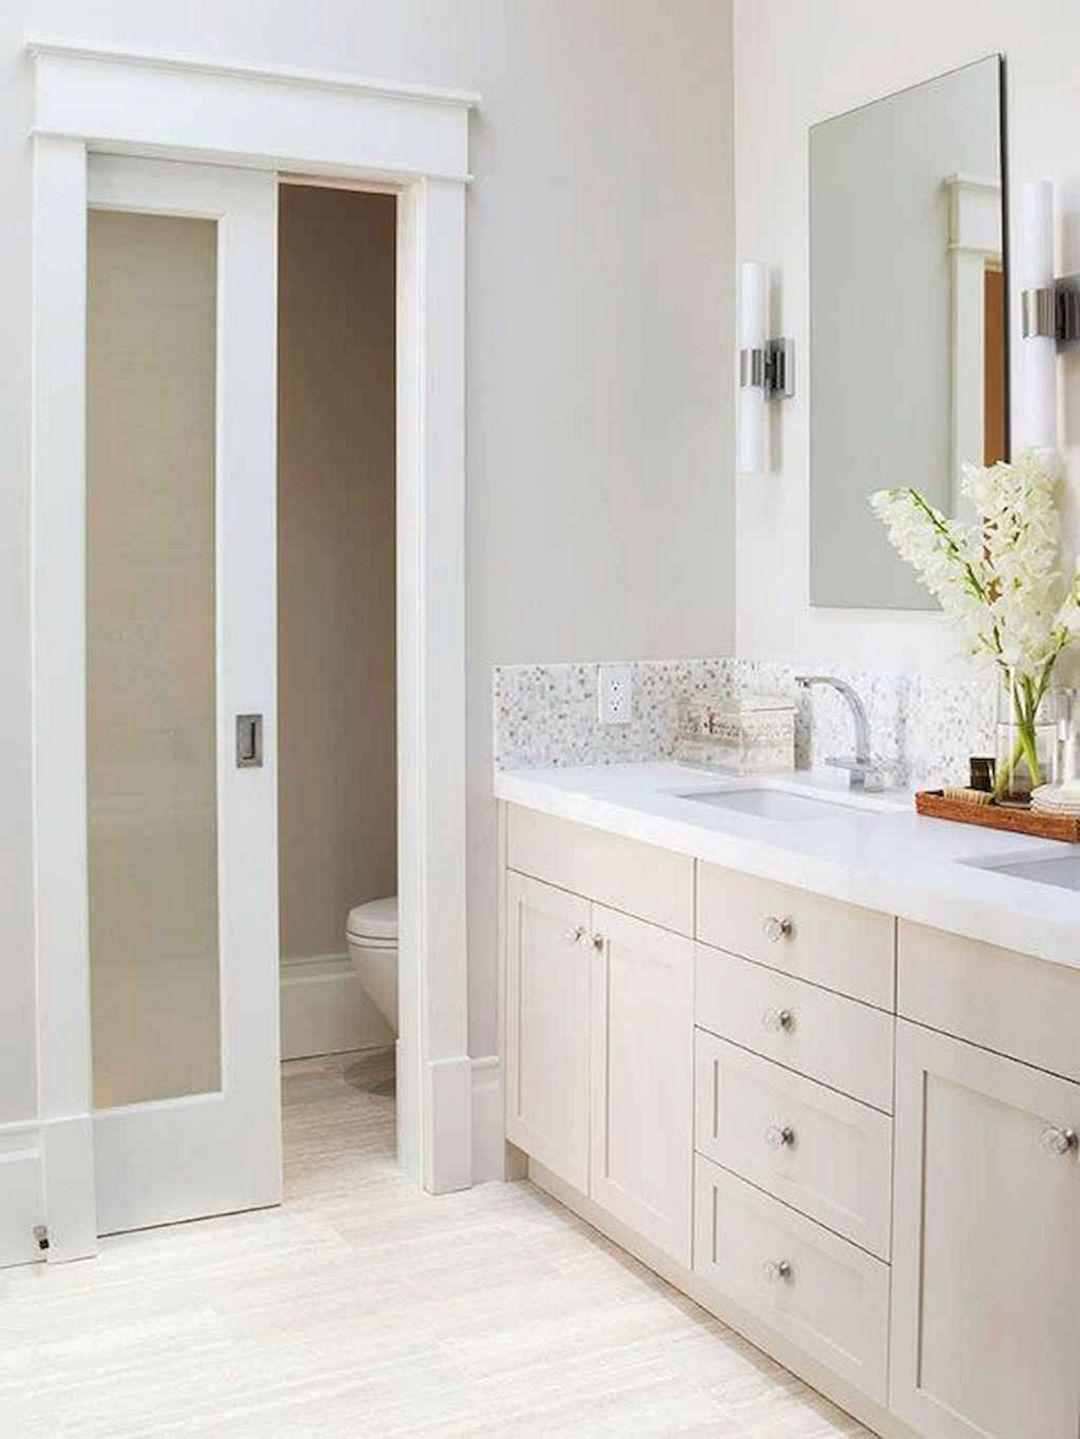 Beautiful Bathroom Sliding Door Ideas That Inspire You Bathroomdoorideas Bathroomideas In 2020 Master Bathroom Design Small Master Bathroom Small Bathroom Remodel